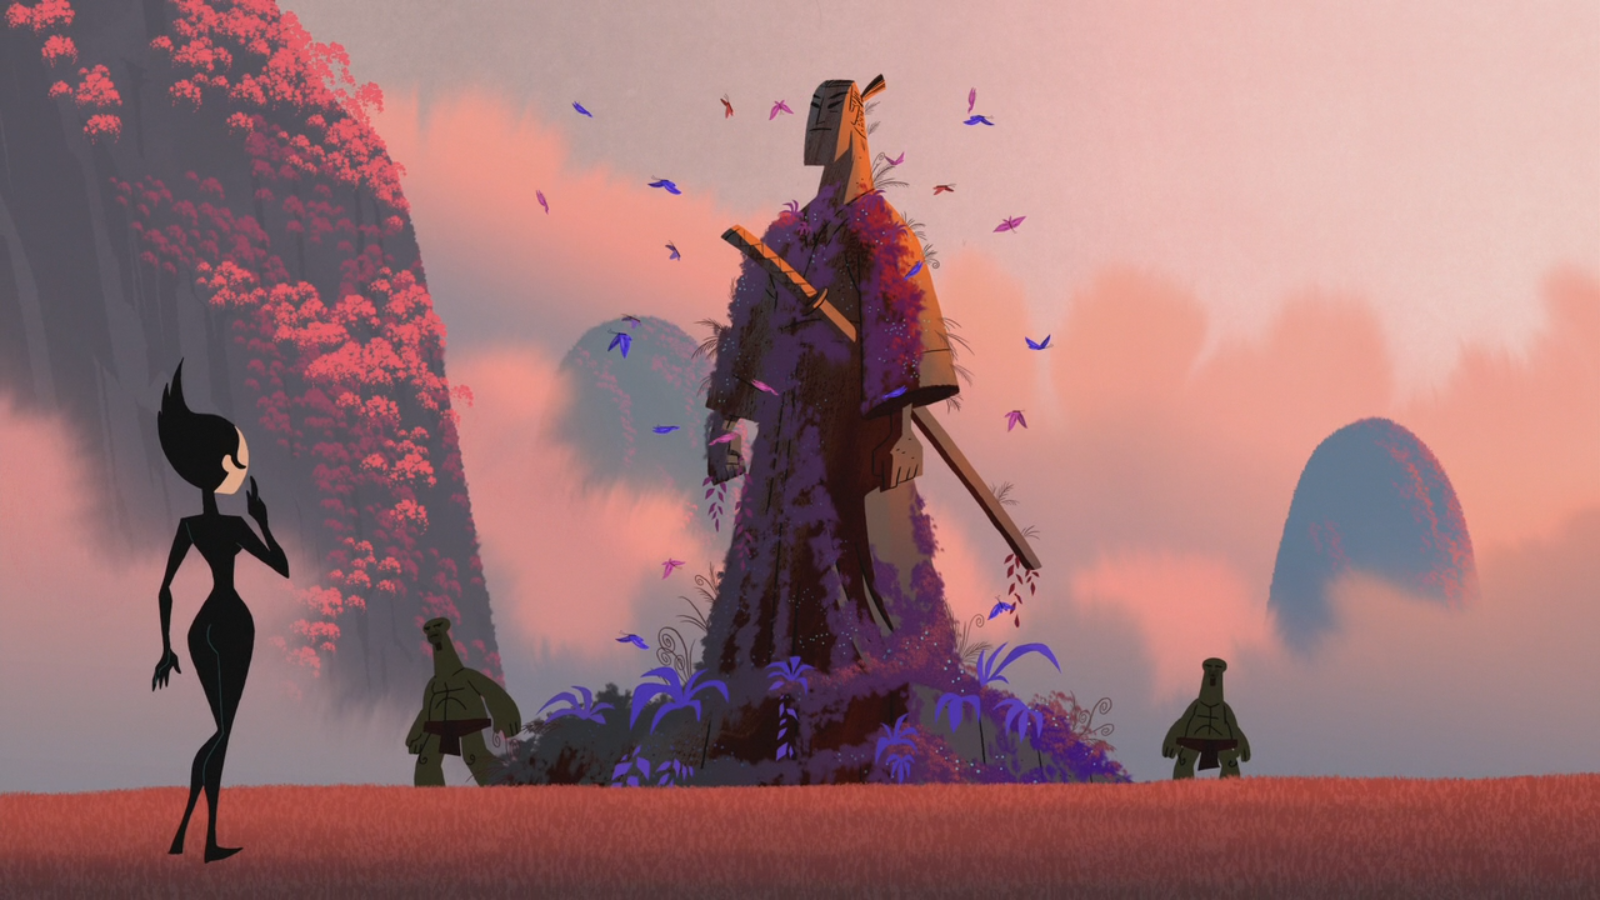 Samurai Jack Season 5 Backgrounds Posted By John Peltier